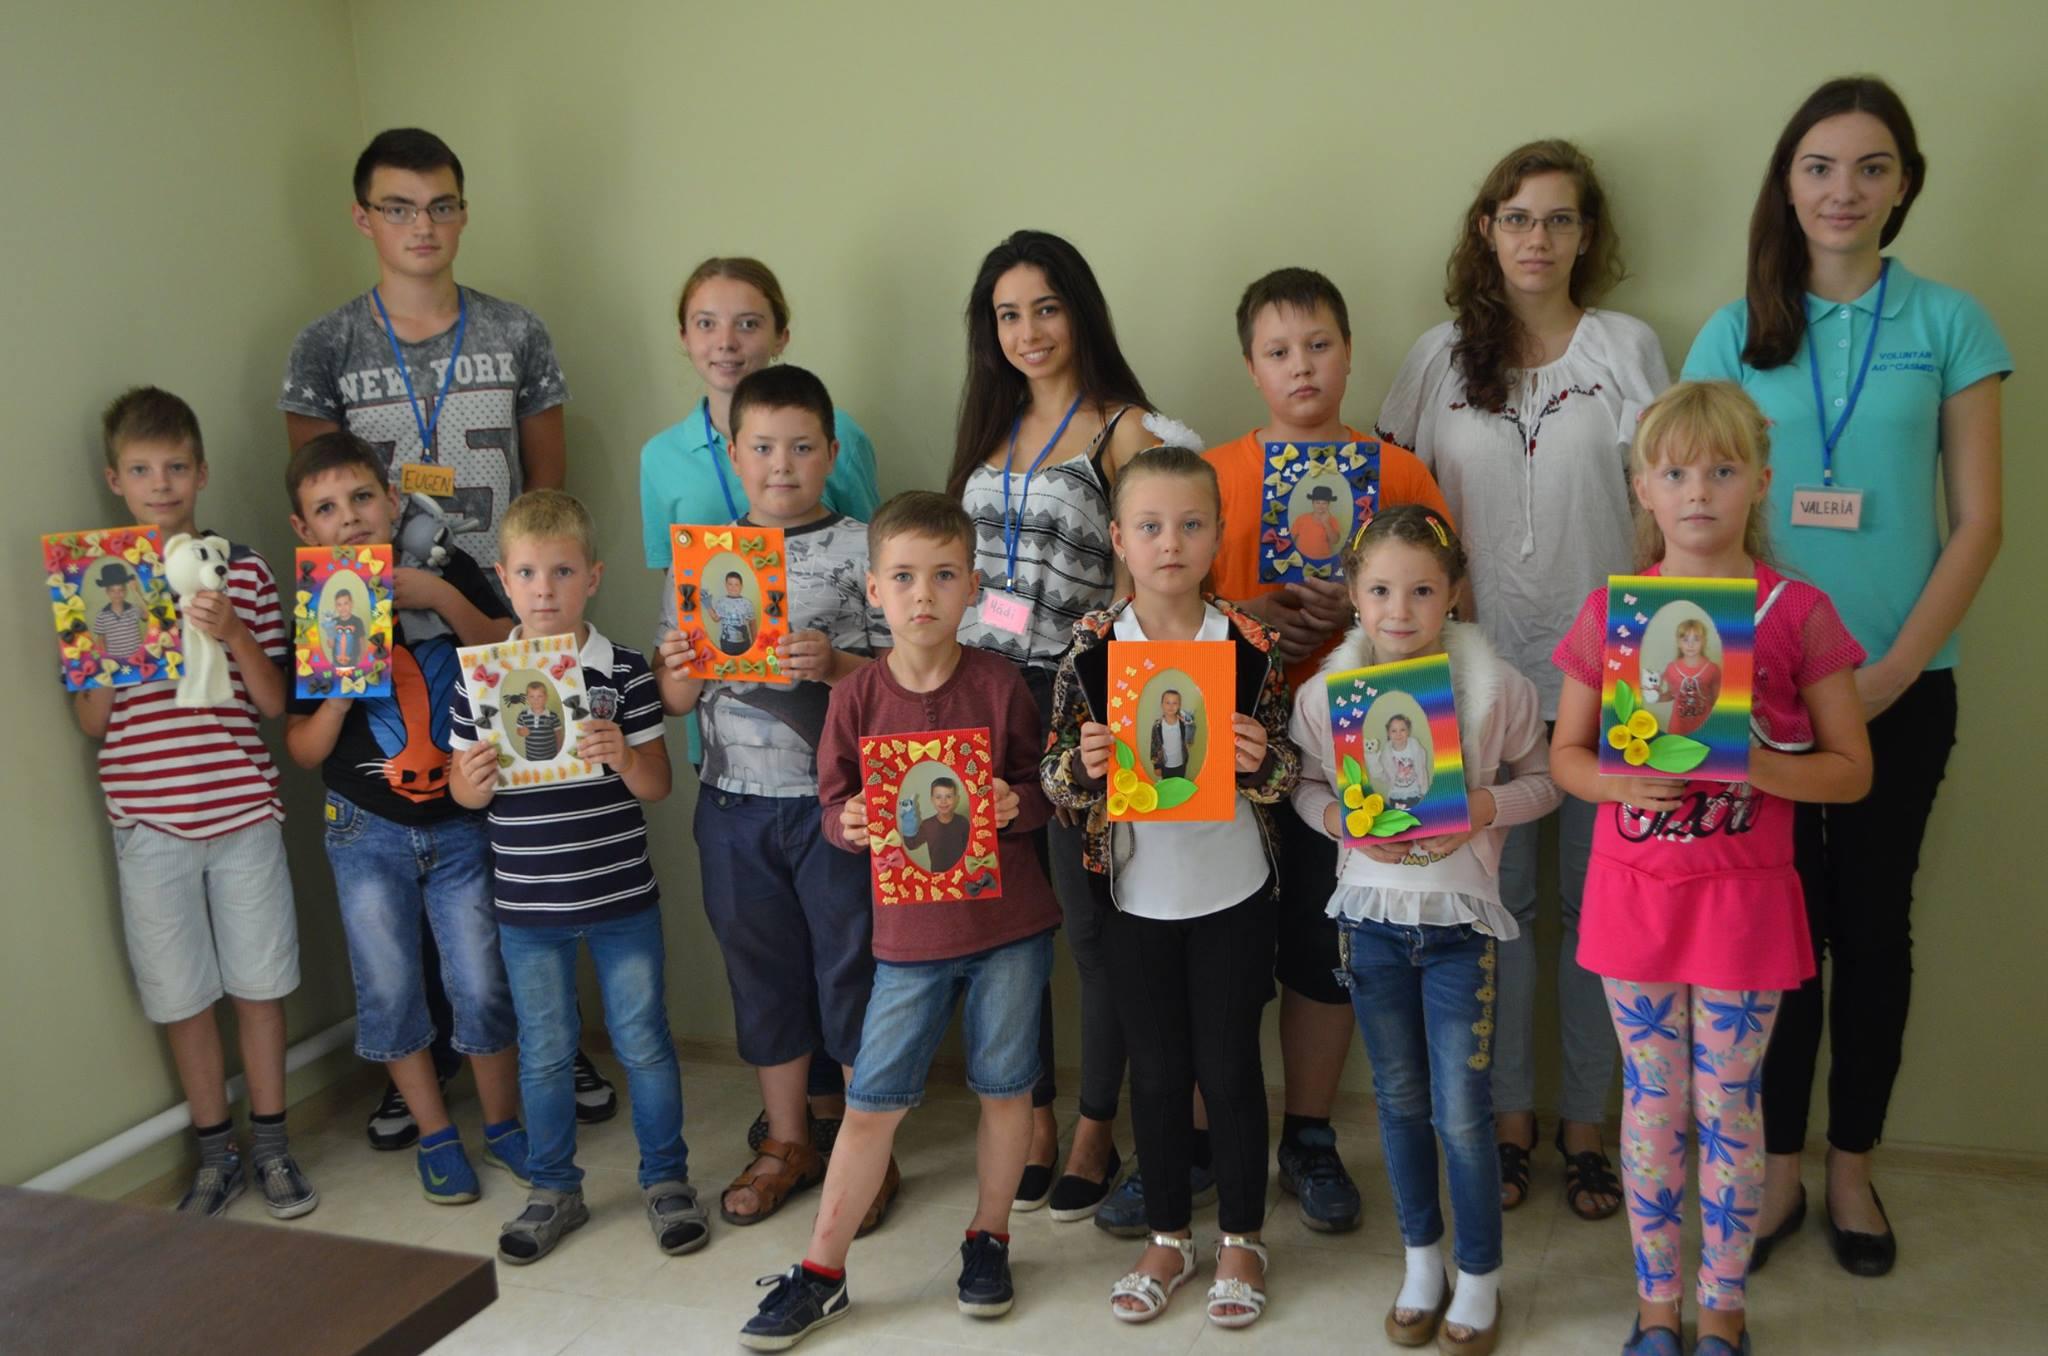 CASMED_Balti_volunteering_kids_workshop (4)